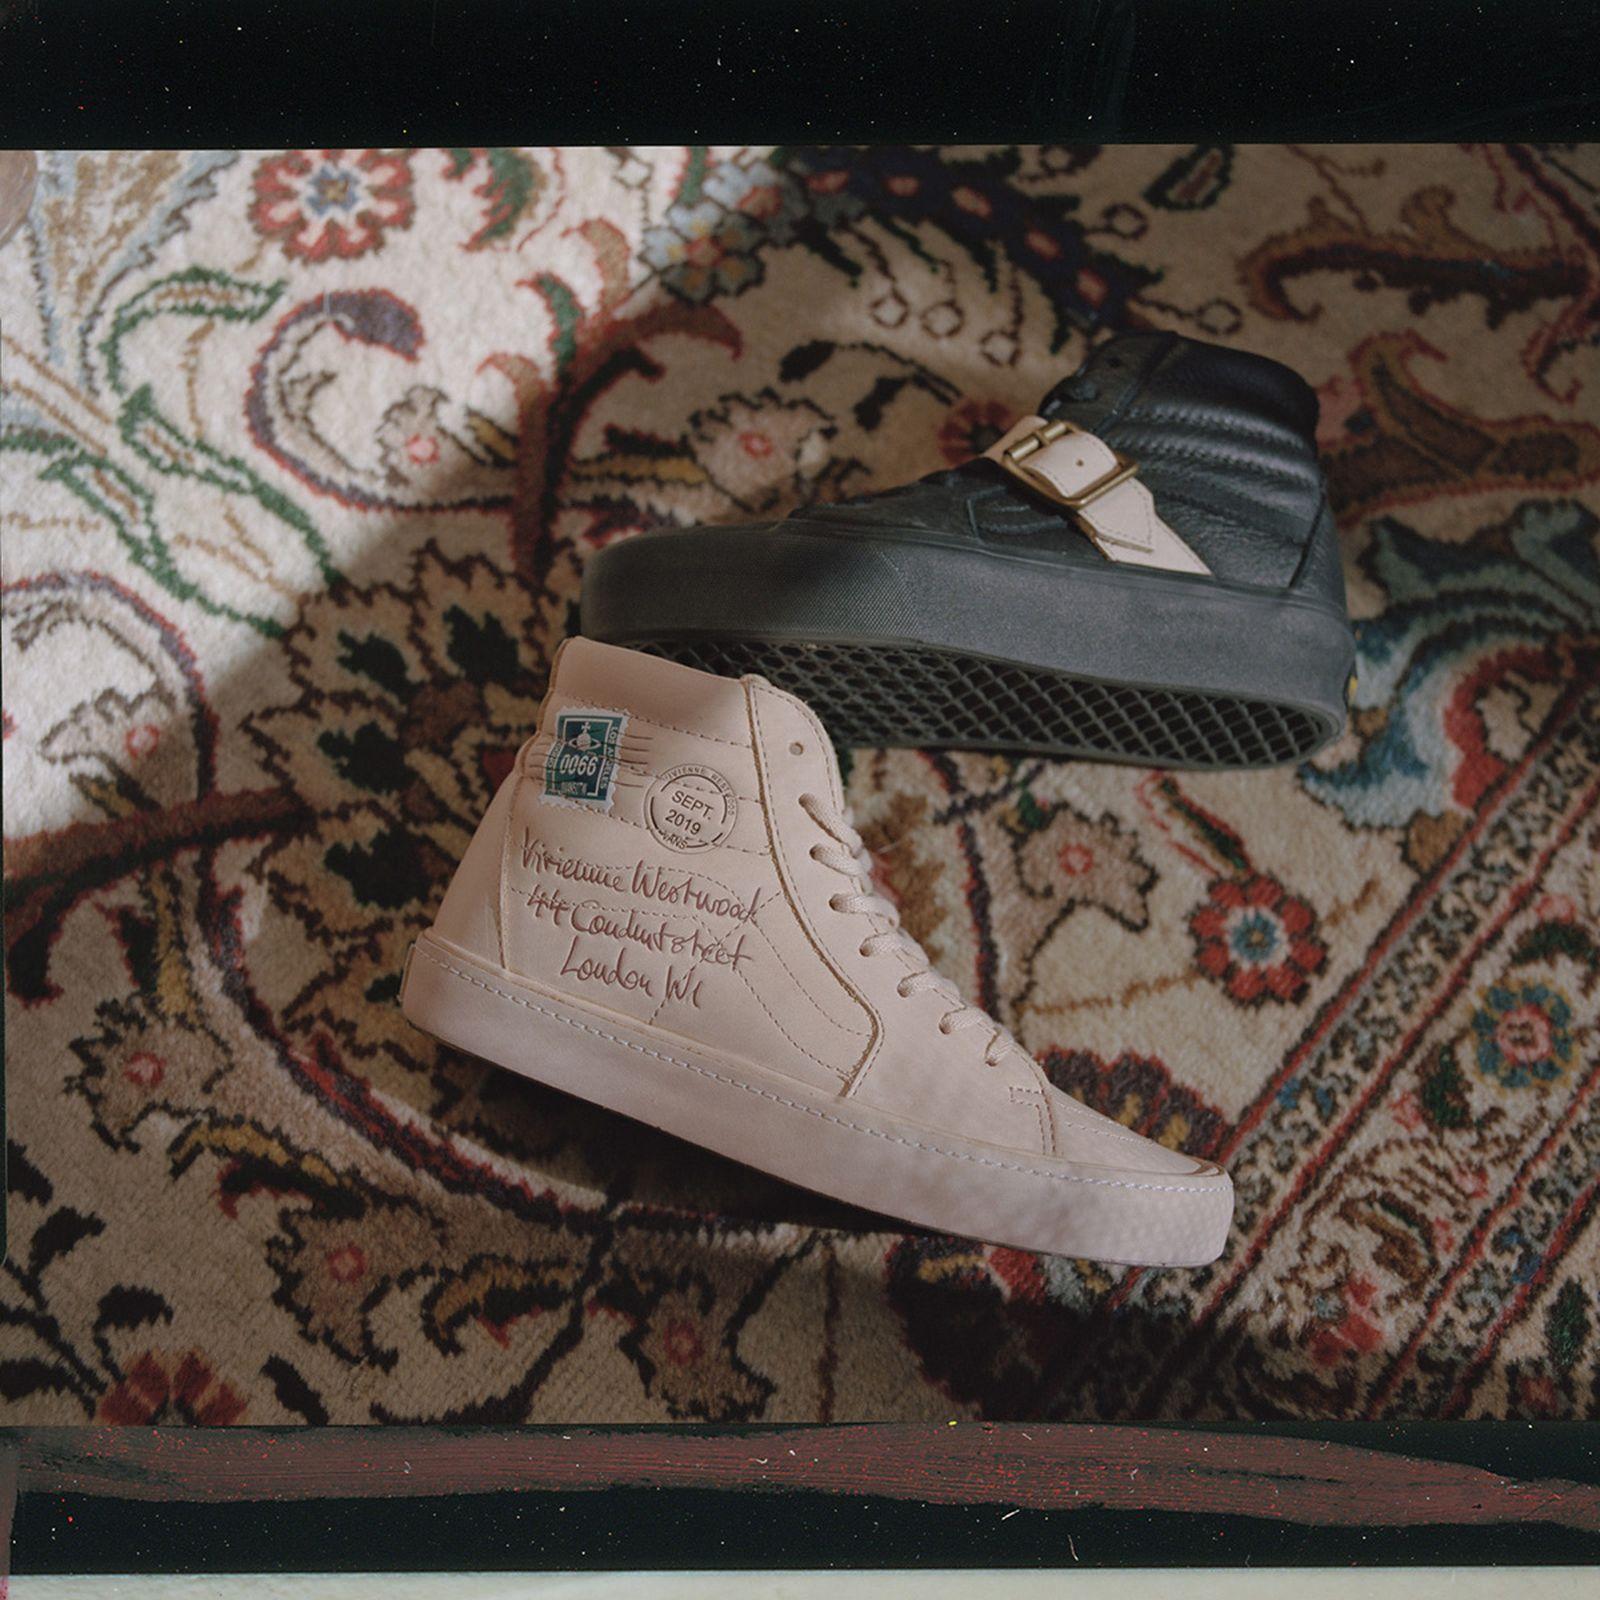 Vans Vivienne Westwood Anglomania collection Sk8-Hi